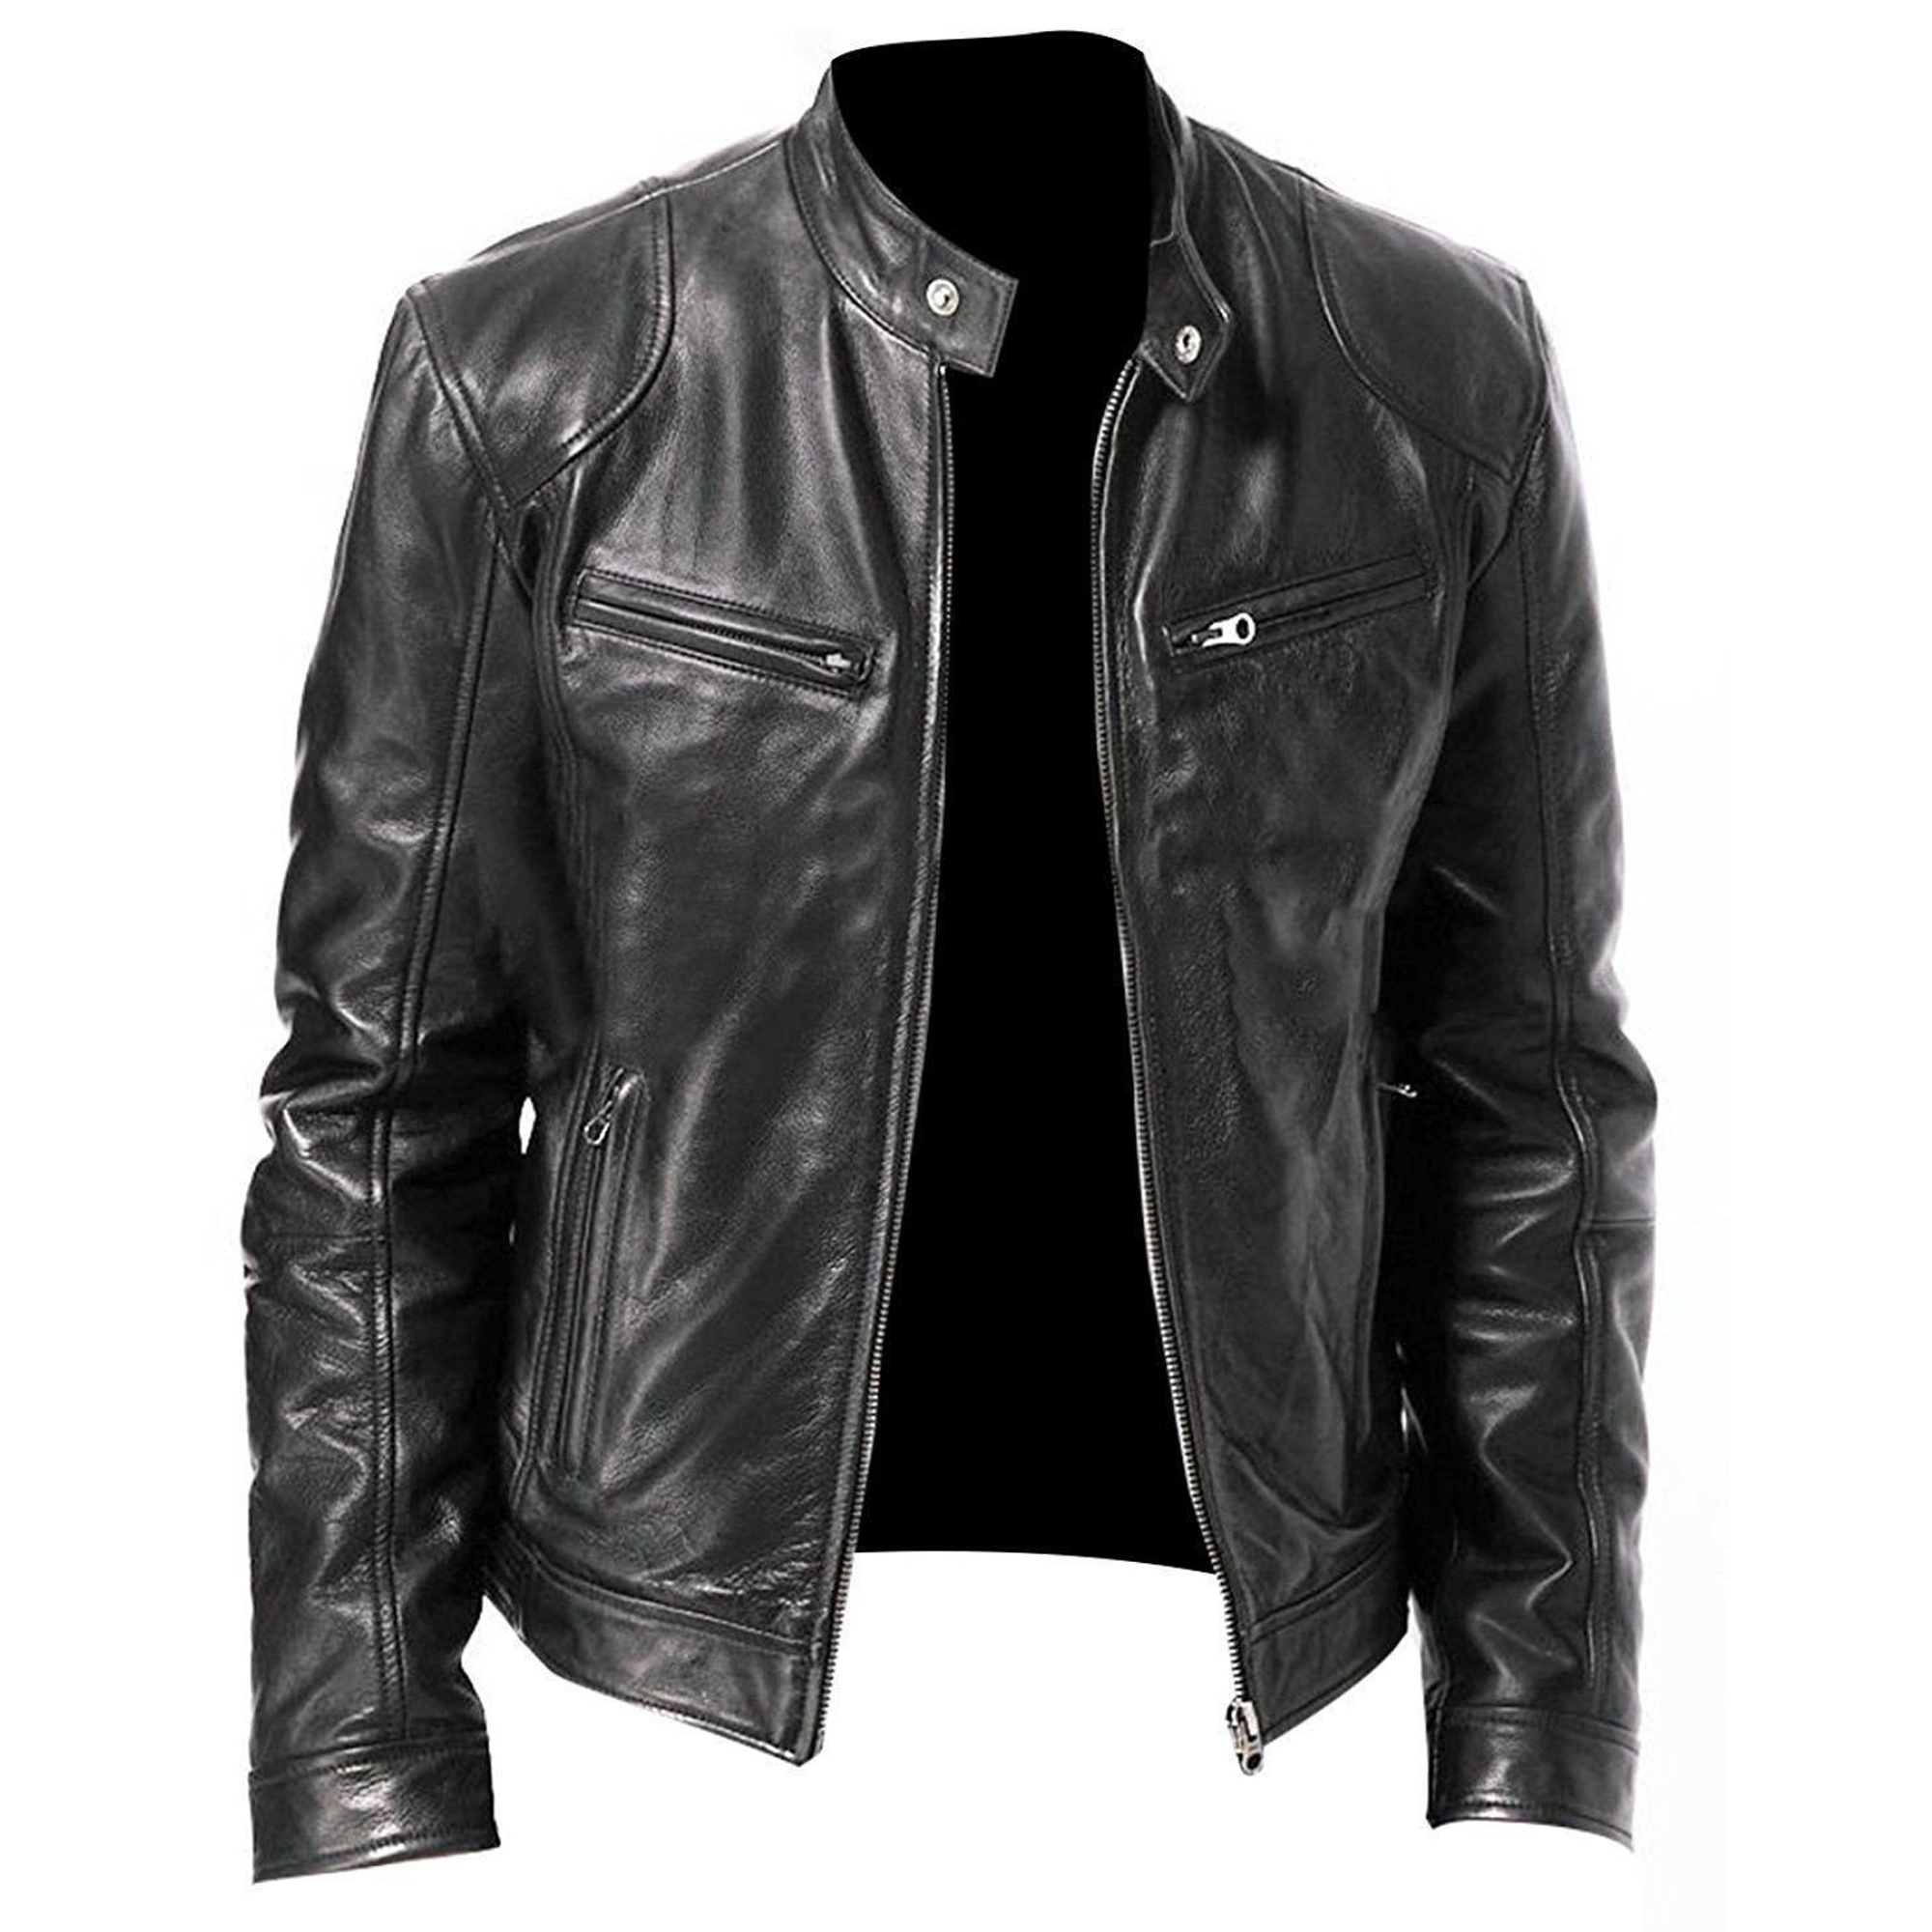 Men Genuine Lambskin Leather White Motorcycle Jacket Slim fit Biker Jacket Coat